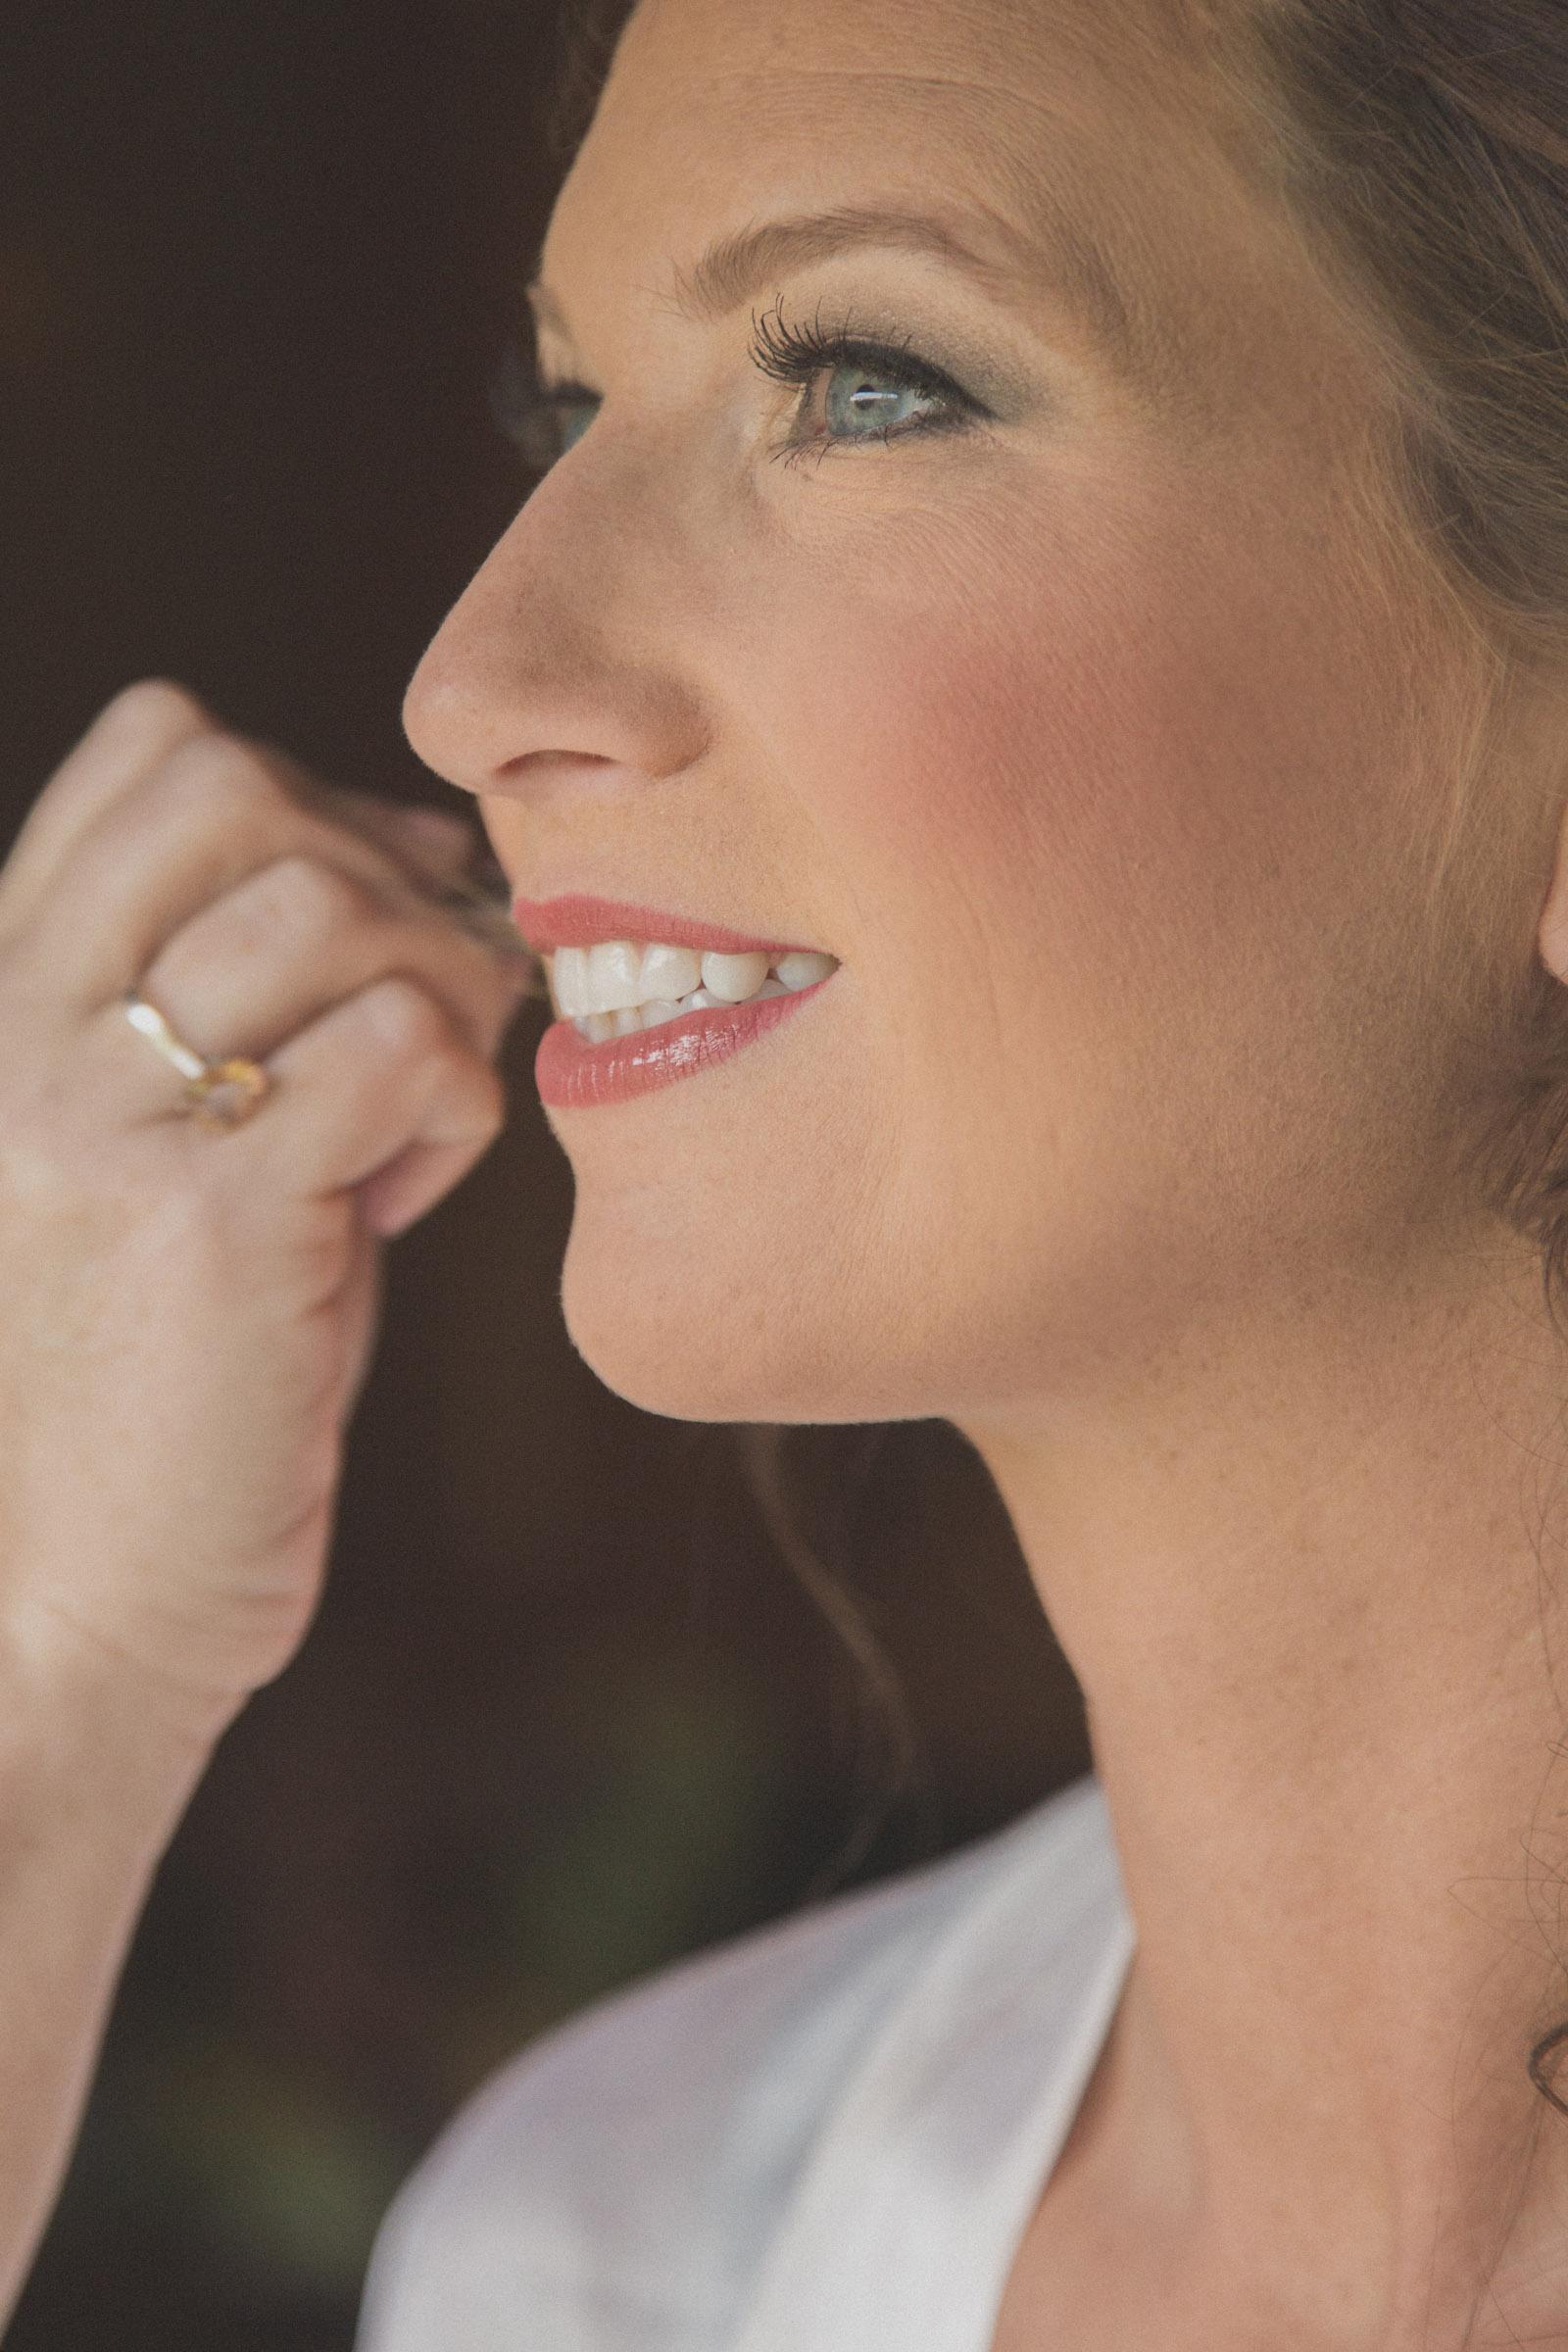 Destination Wedding Makeup Tips : Destination Wedding Makeup Tips Free Pictures Finder